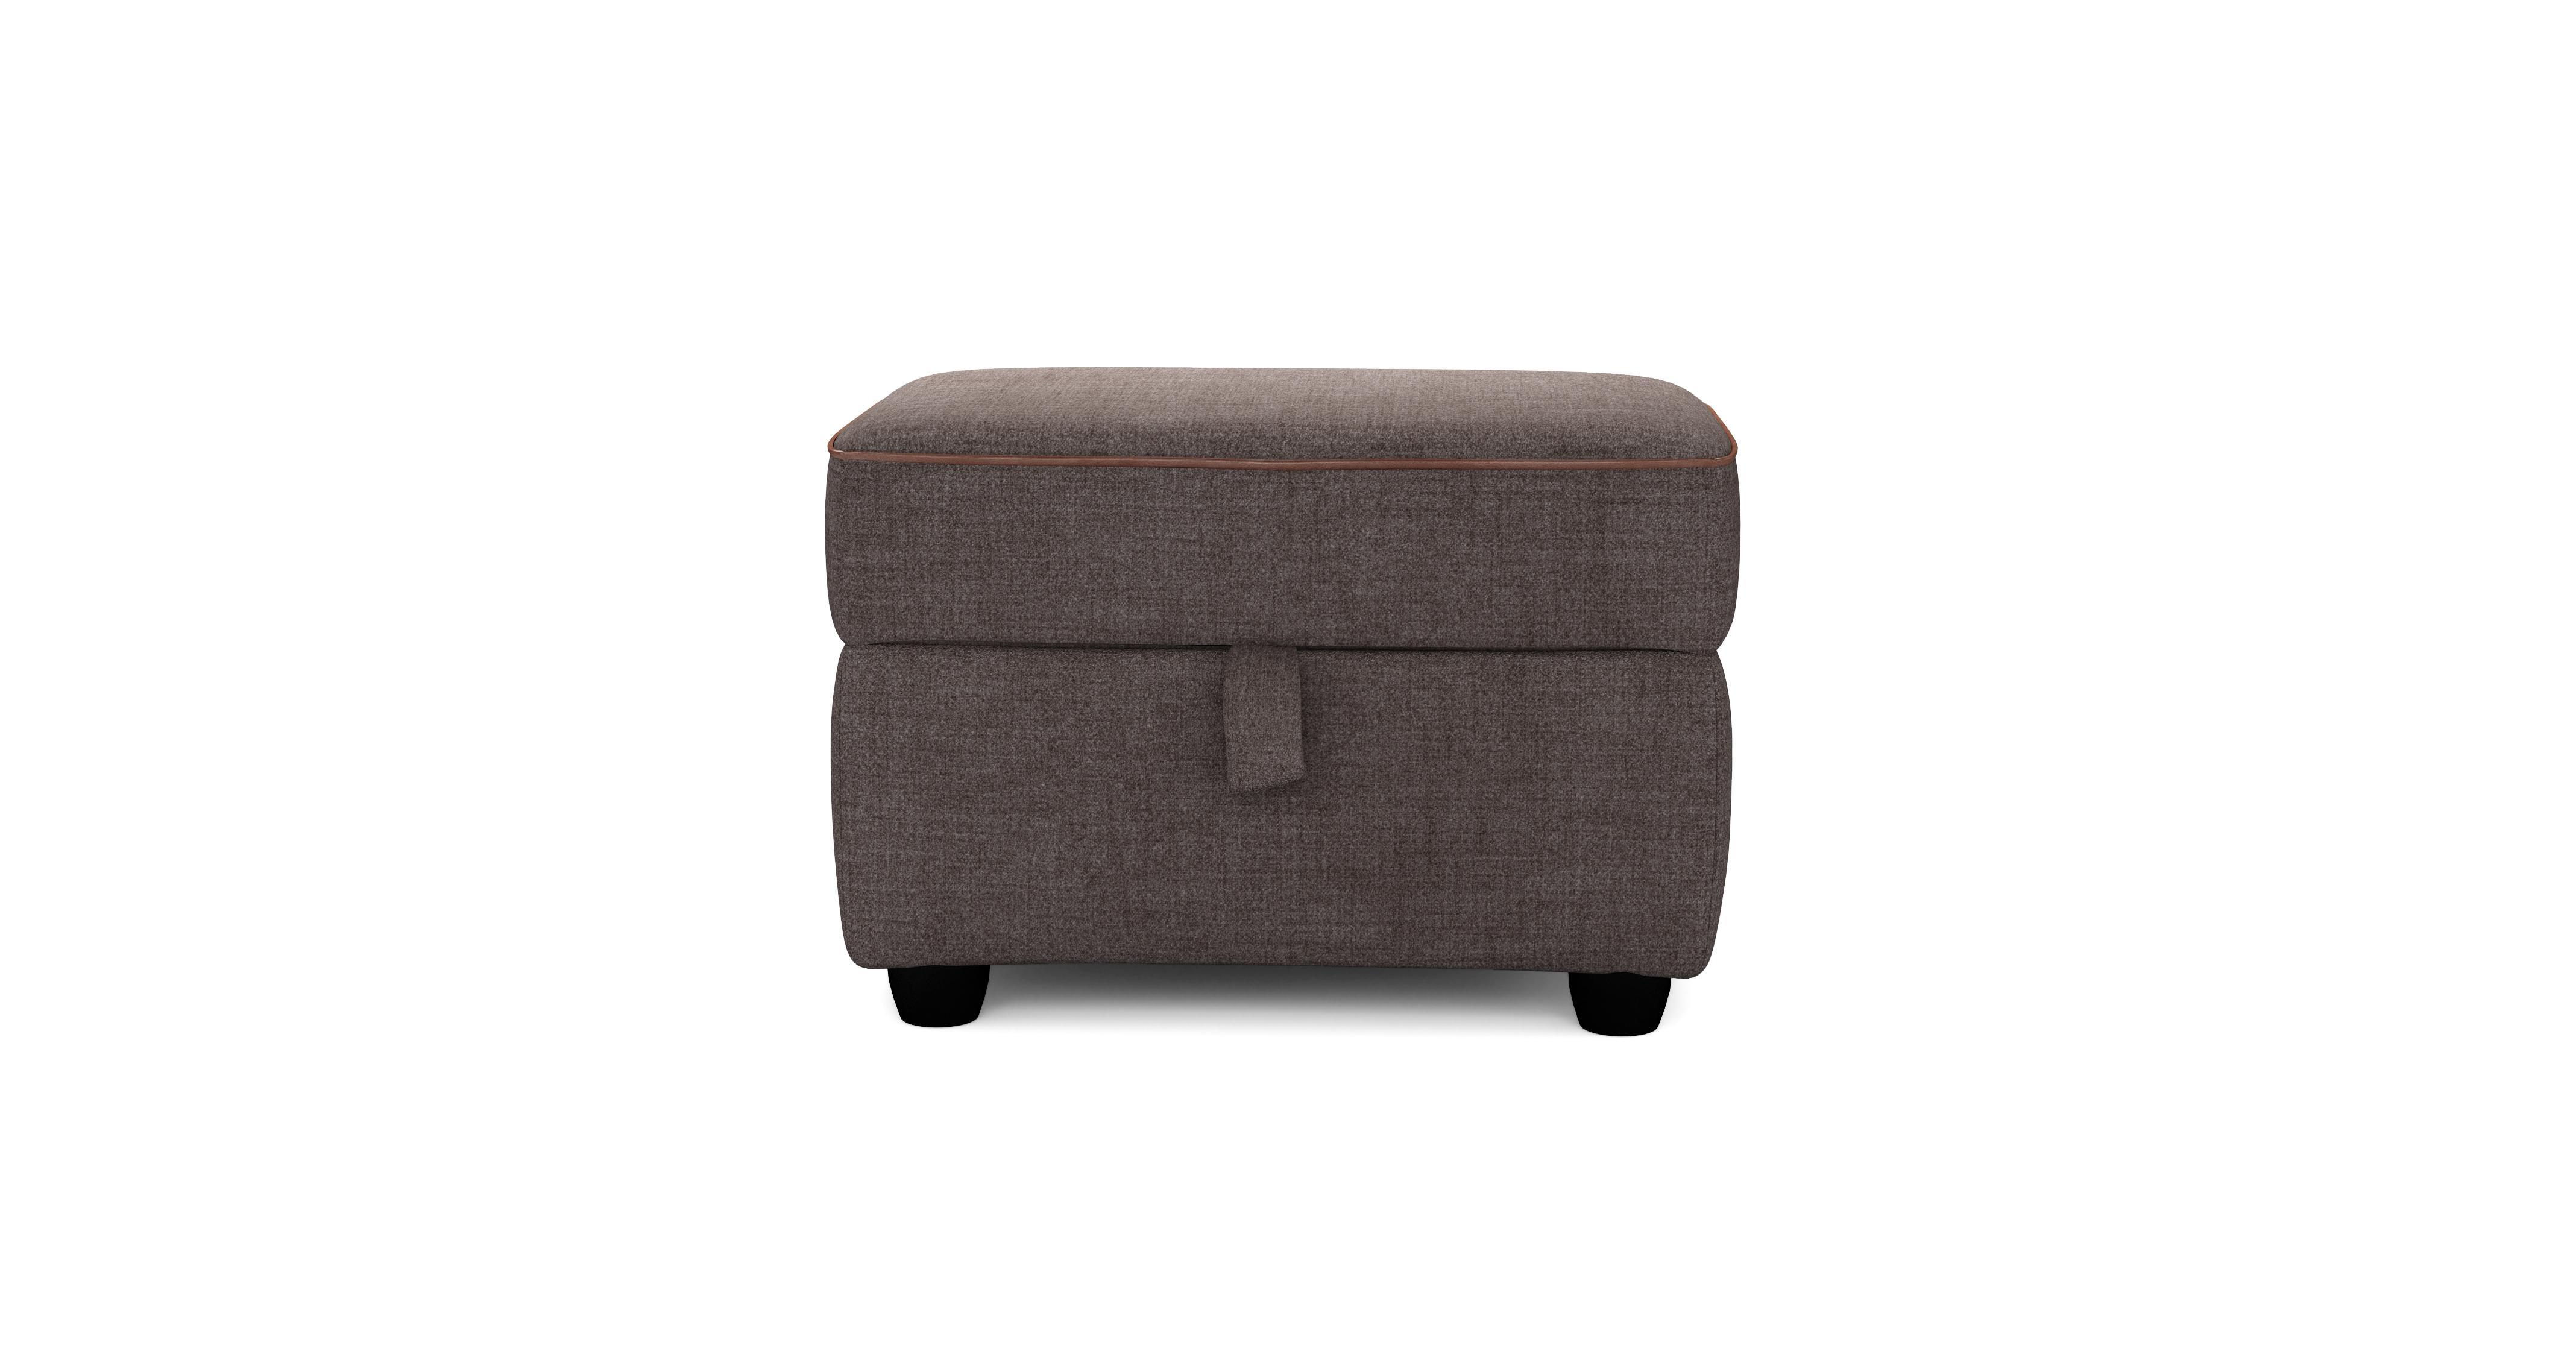 dfs moray sofa reviews 3 cushion bed concerto storage footstool alternative fabric